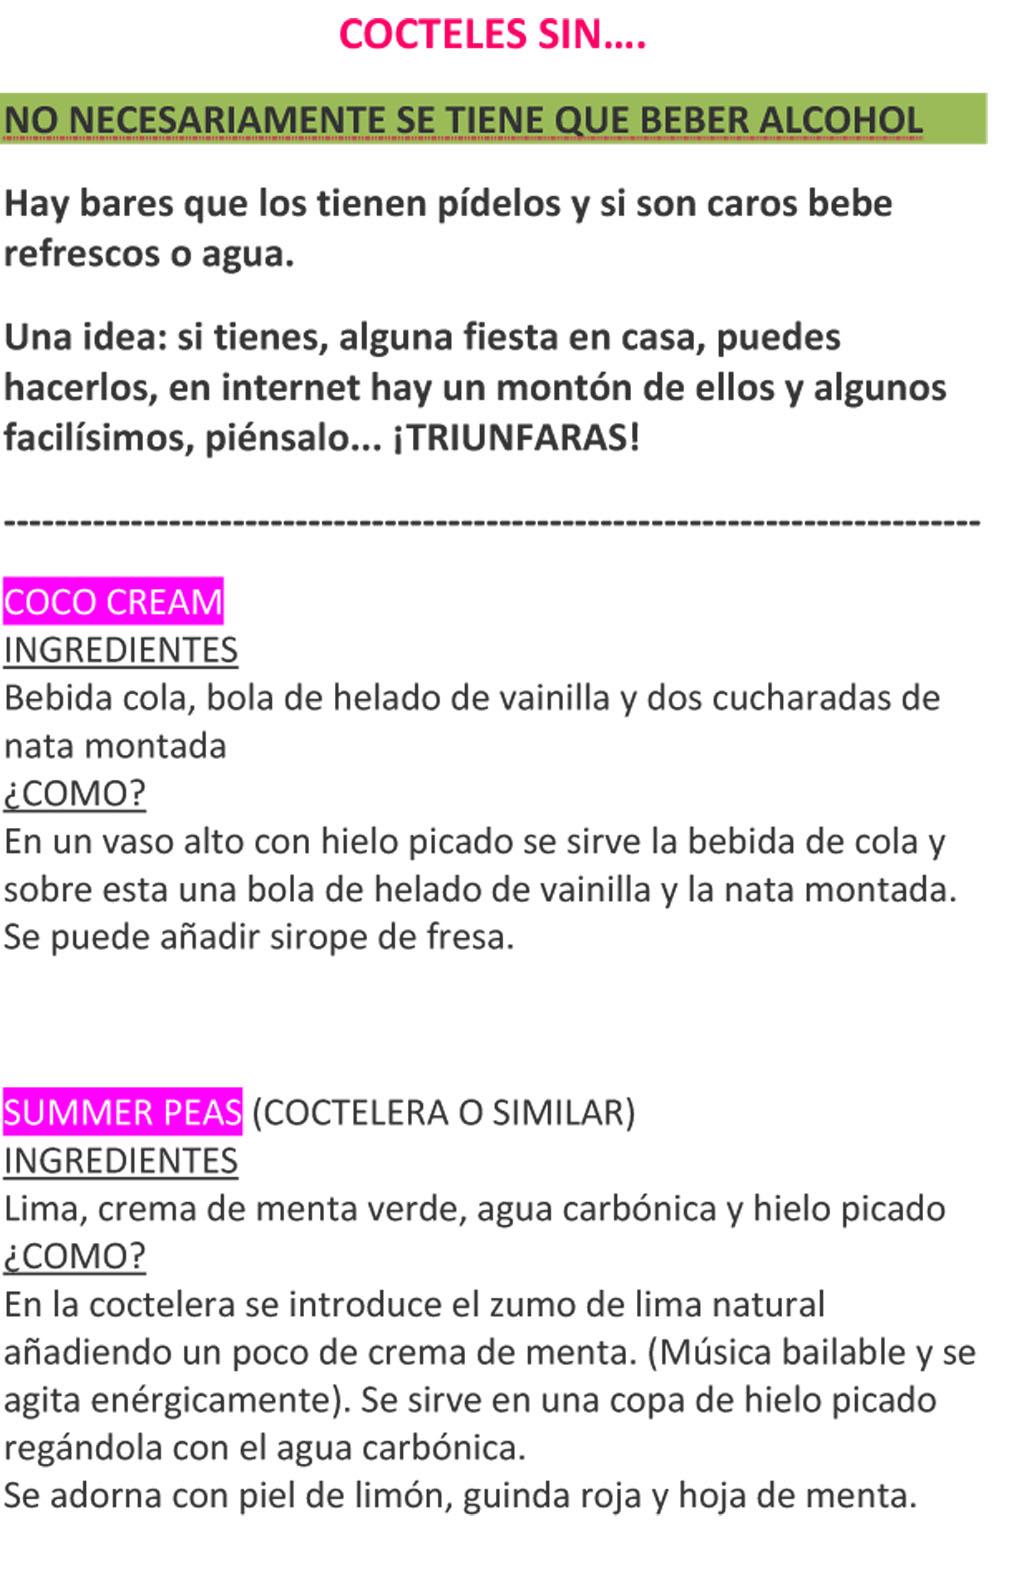 COCTELES SIN ALCOHOL-1